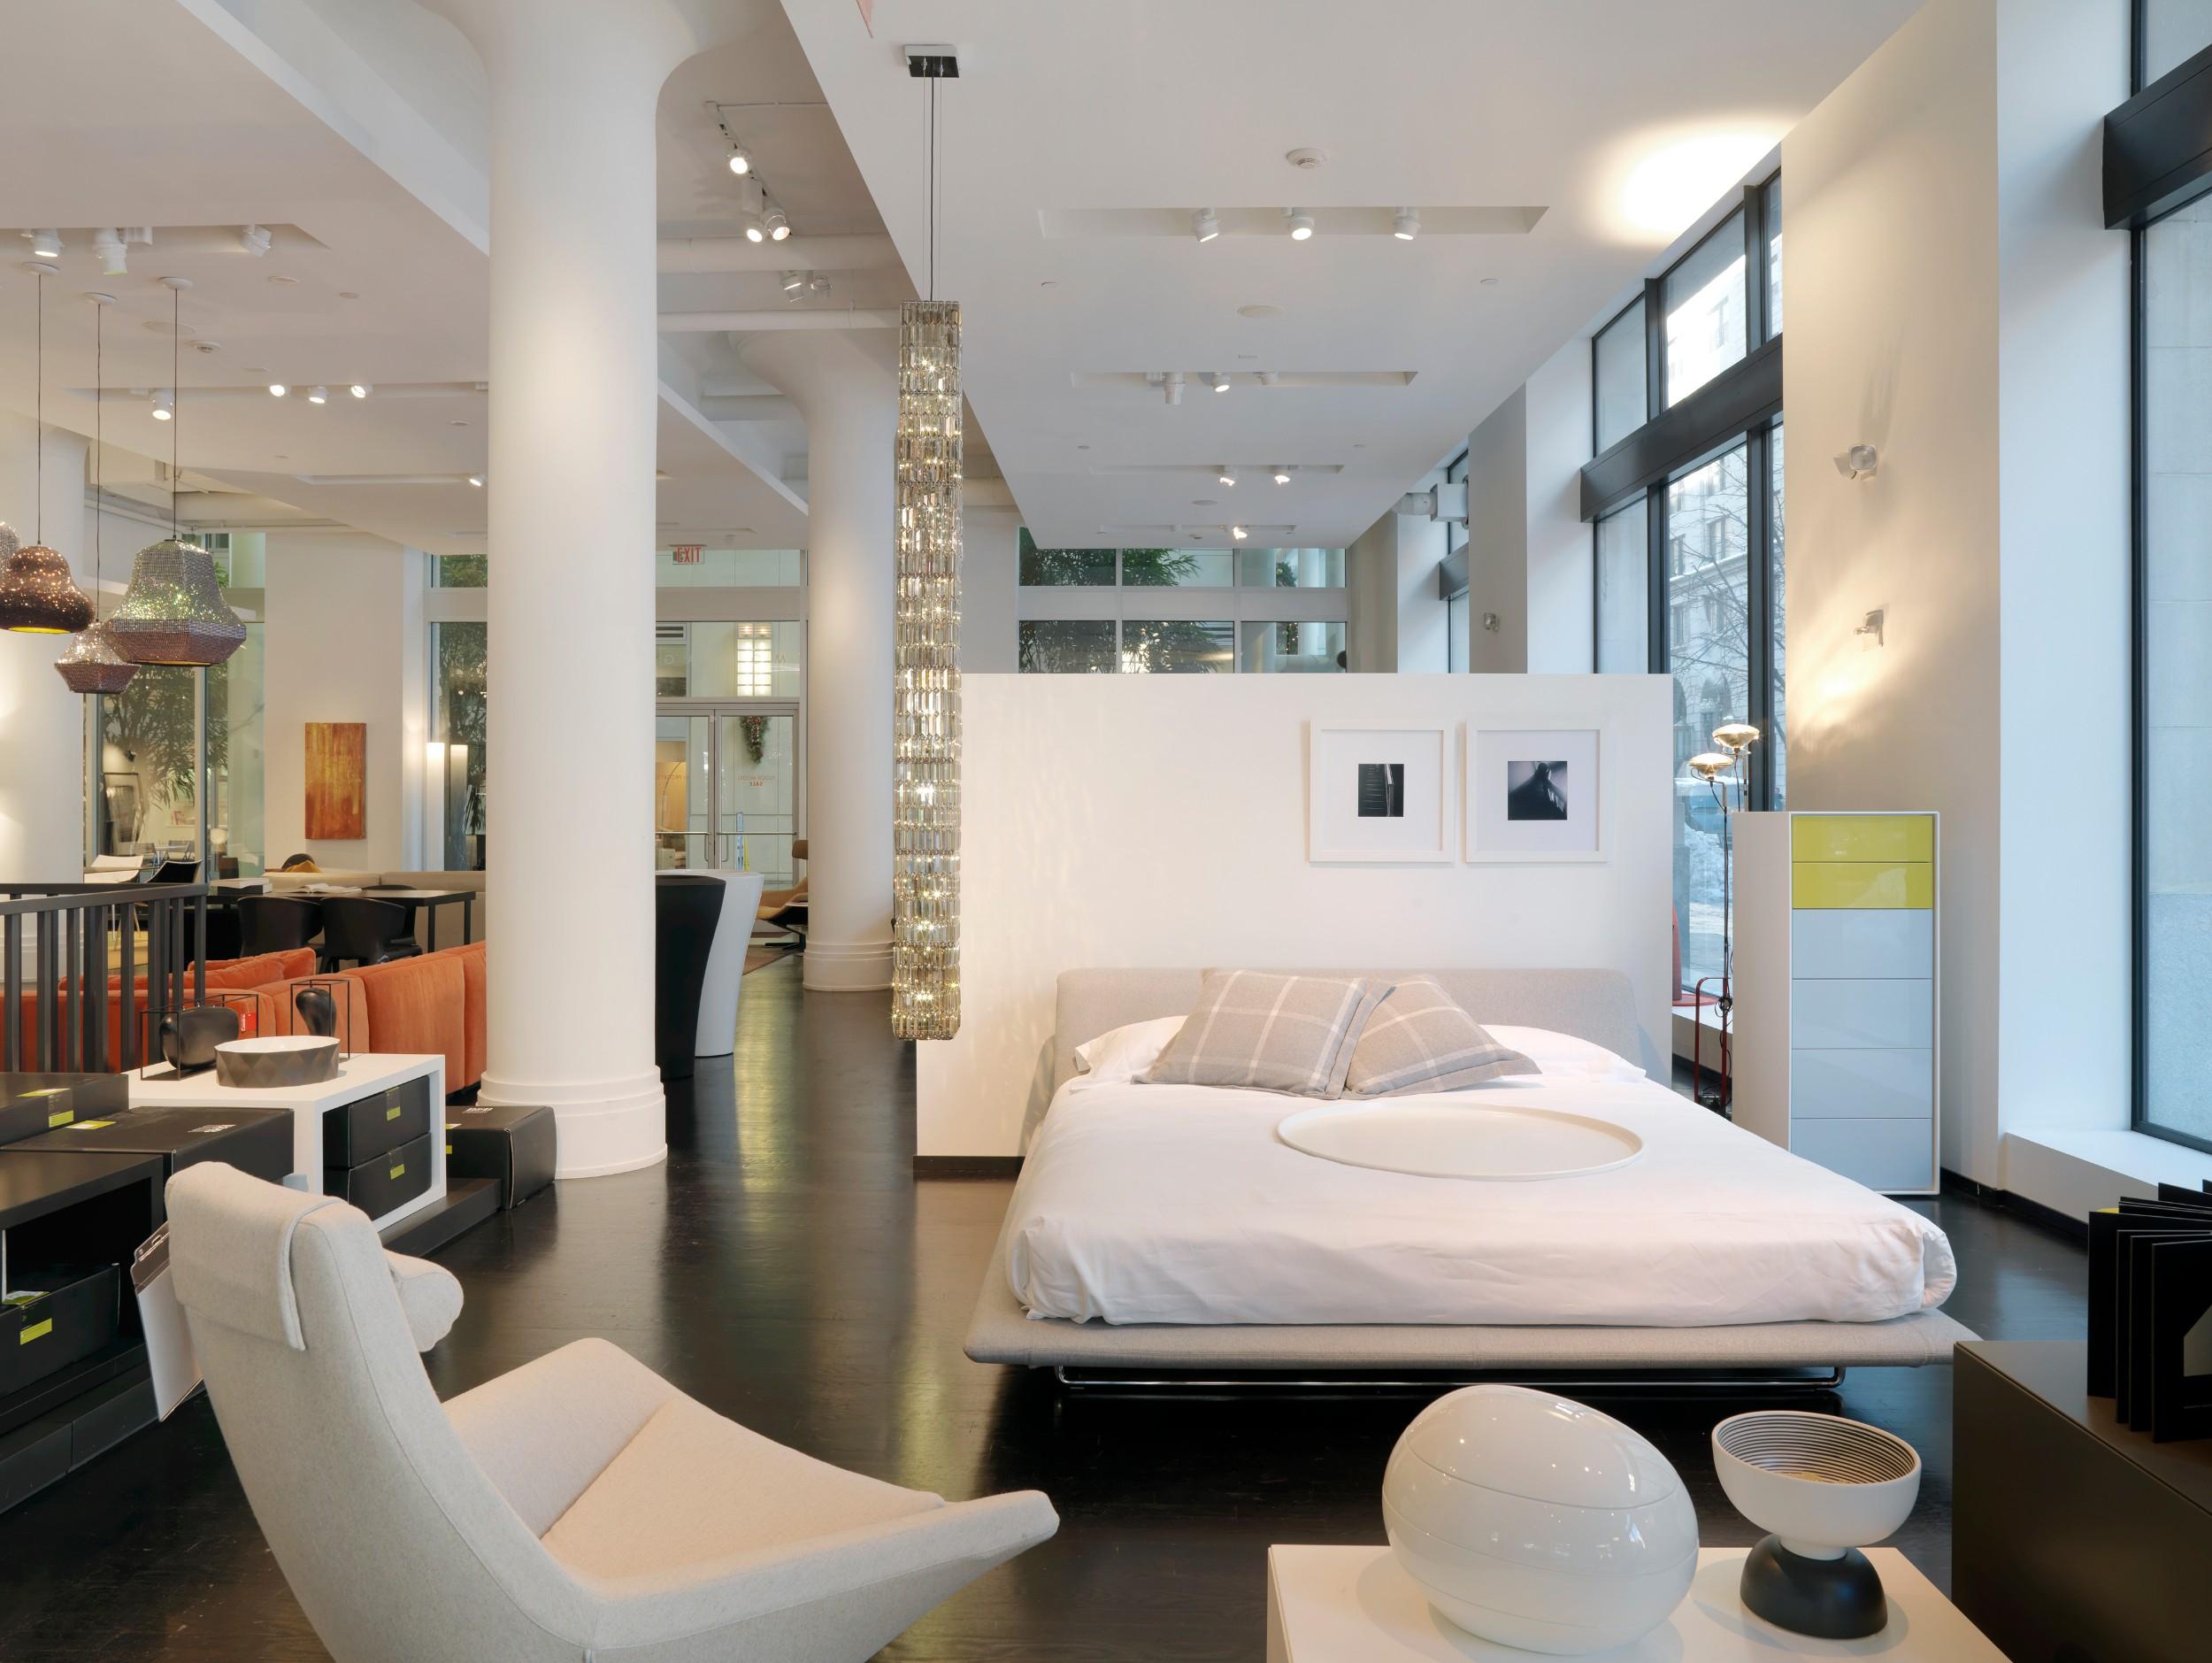 Montage_Corderman_Construction_Showroom_Boston_Furniture_View.jpg